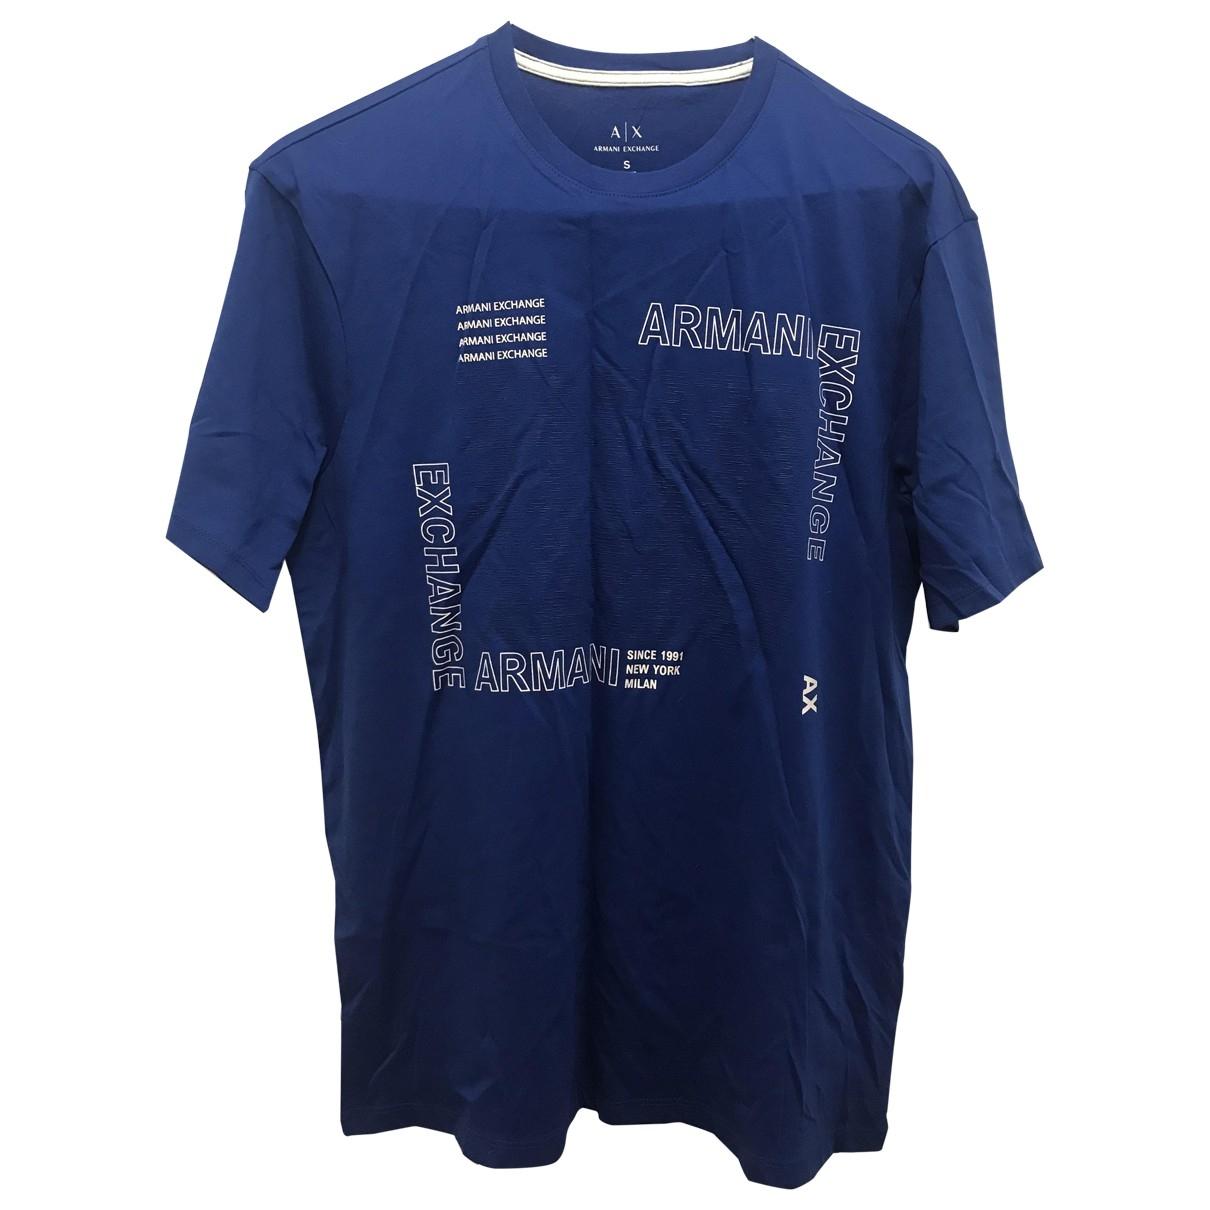 Emporio Armani \N Blue Cotton T-shirts for Men S International